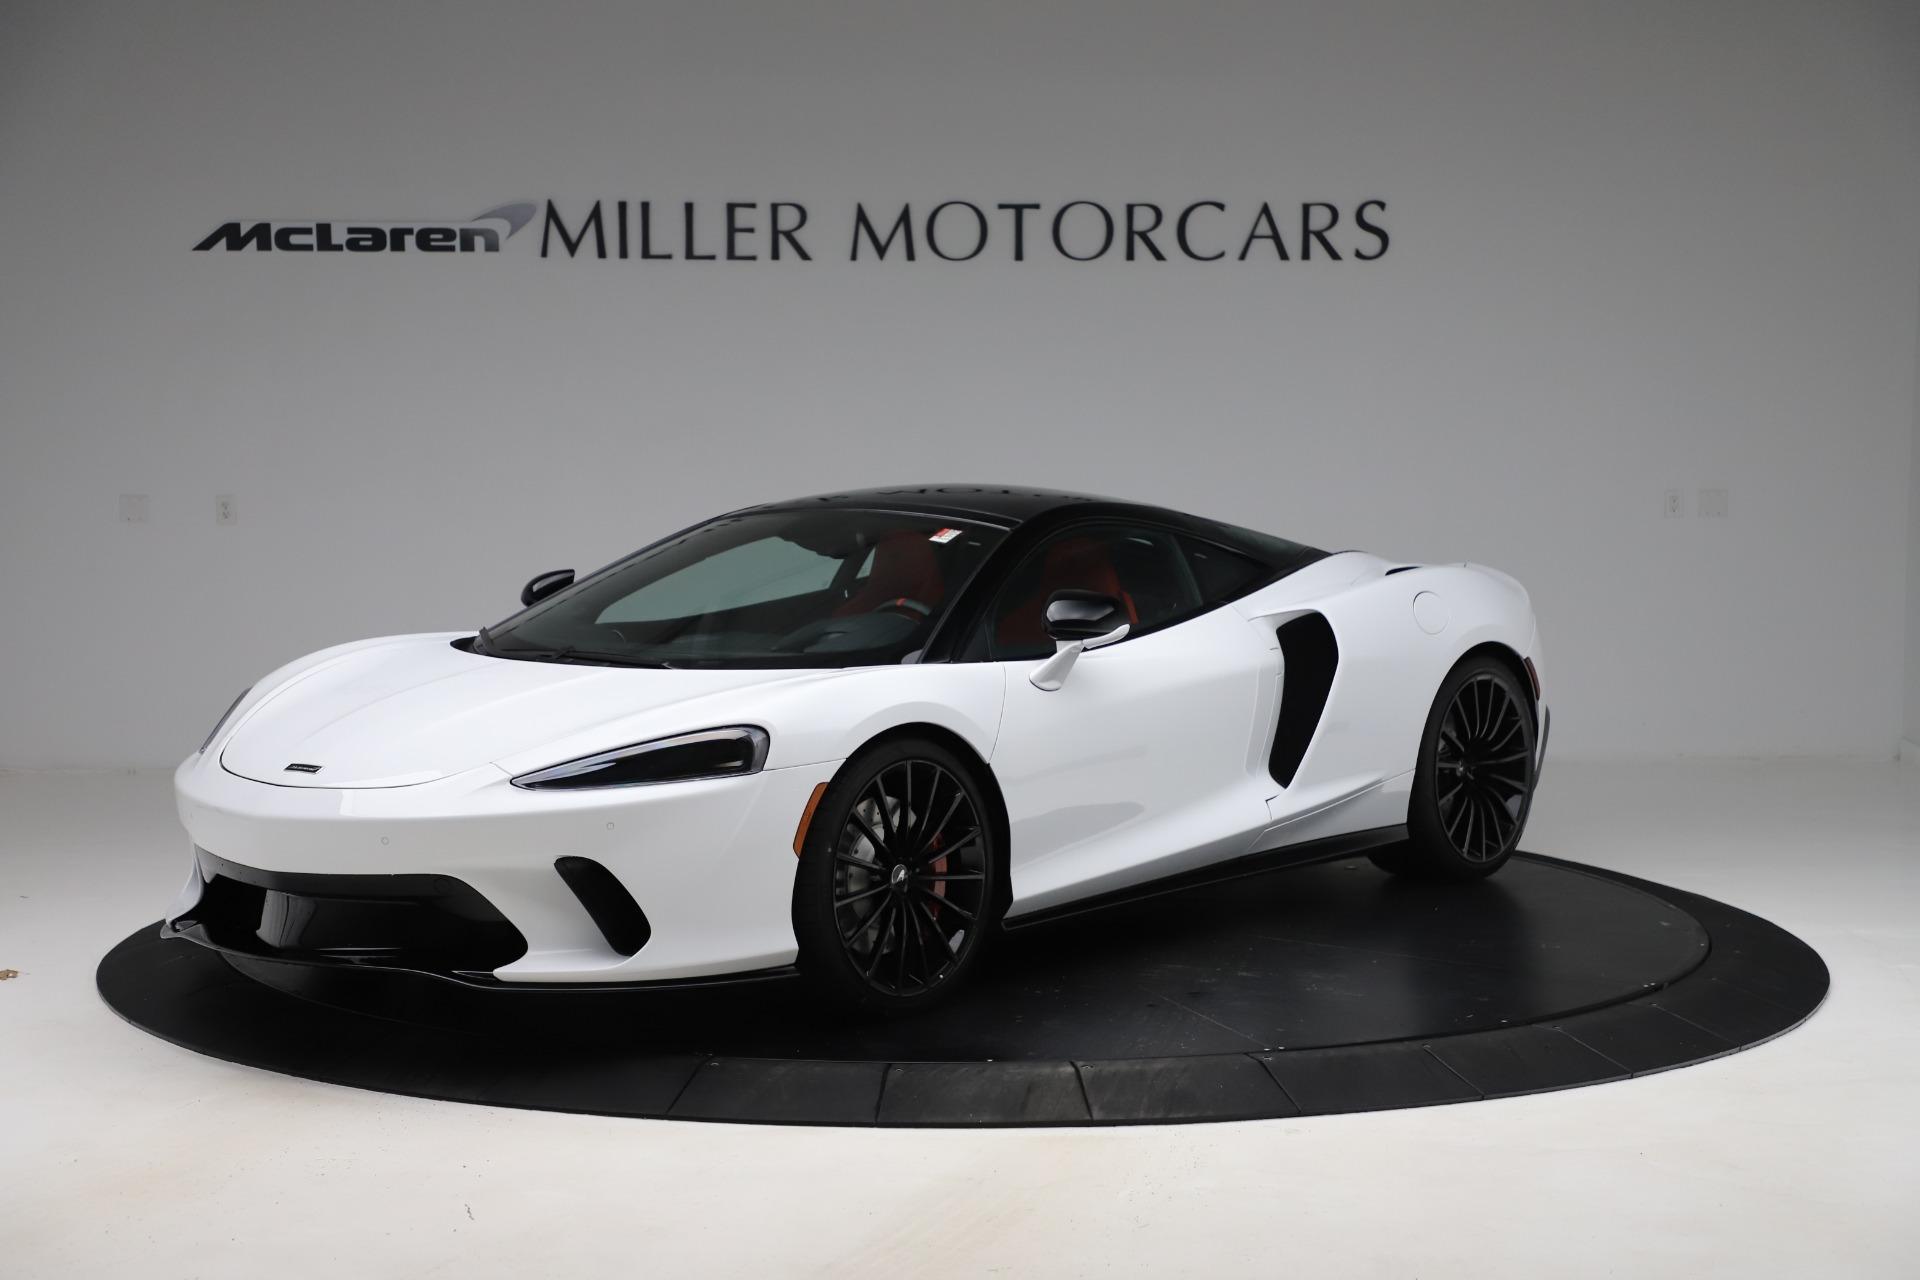 New 2020 McLaren GT Pioneer for sale $257,242 at Rolls-Royce Motor Cars Greenwich in Greenwich CT 06830 1